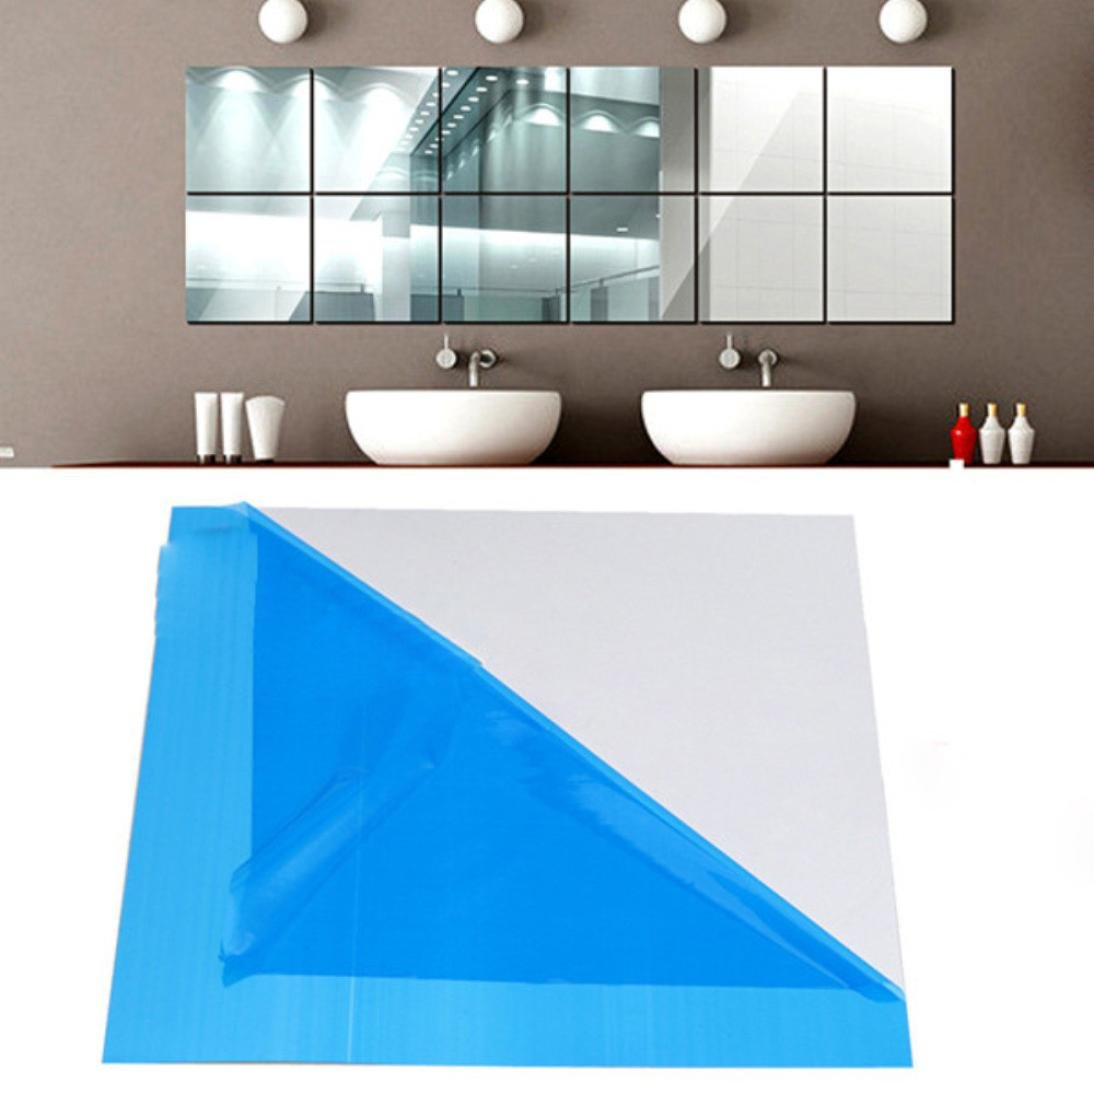 Colorful(TM) 16X Mirror Tile Wall Sticker Square Self Adhesive Room Decor Stick On Modern Art